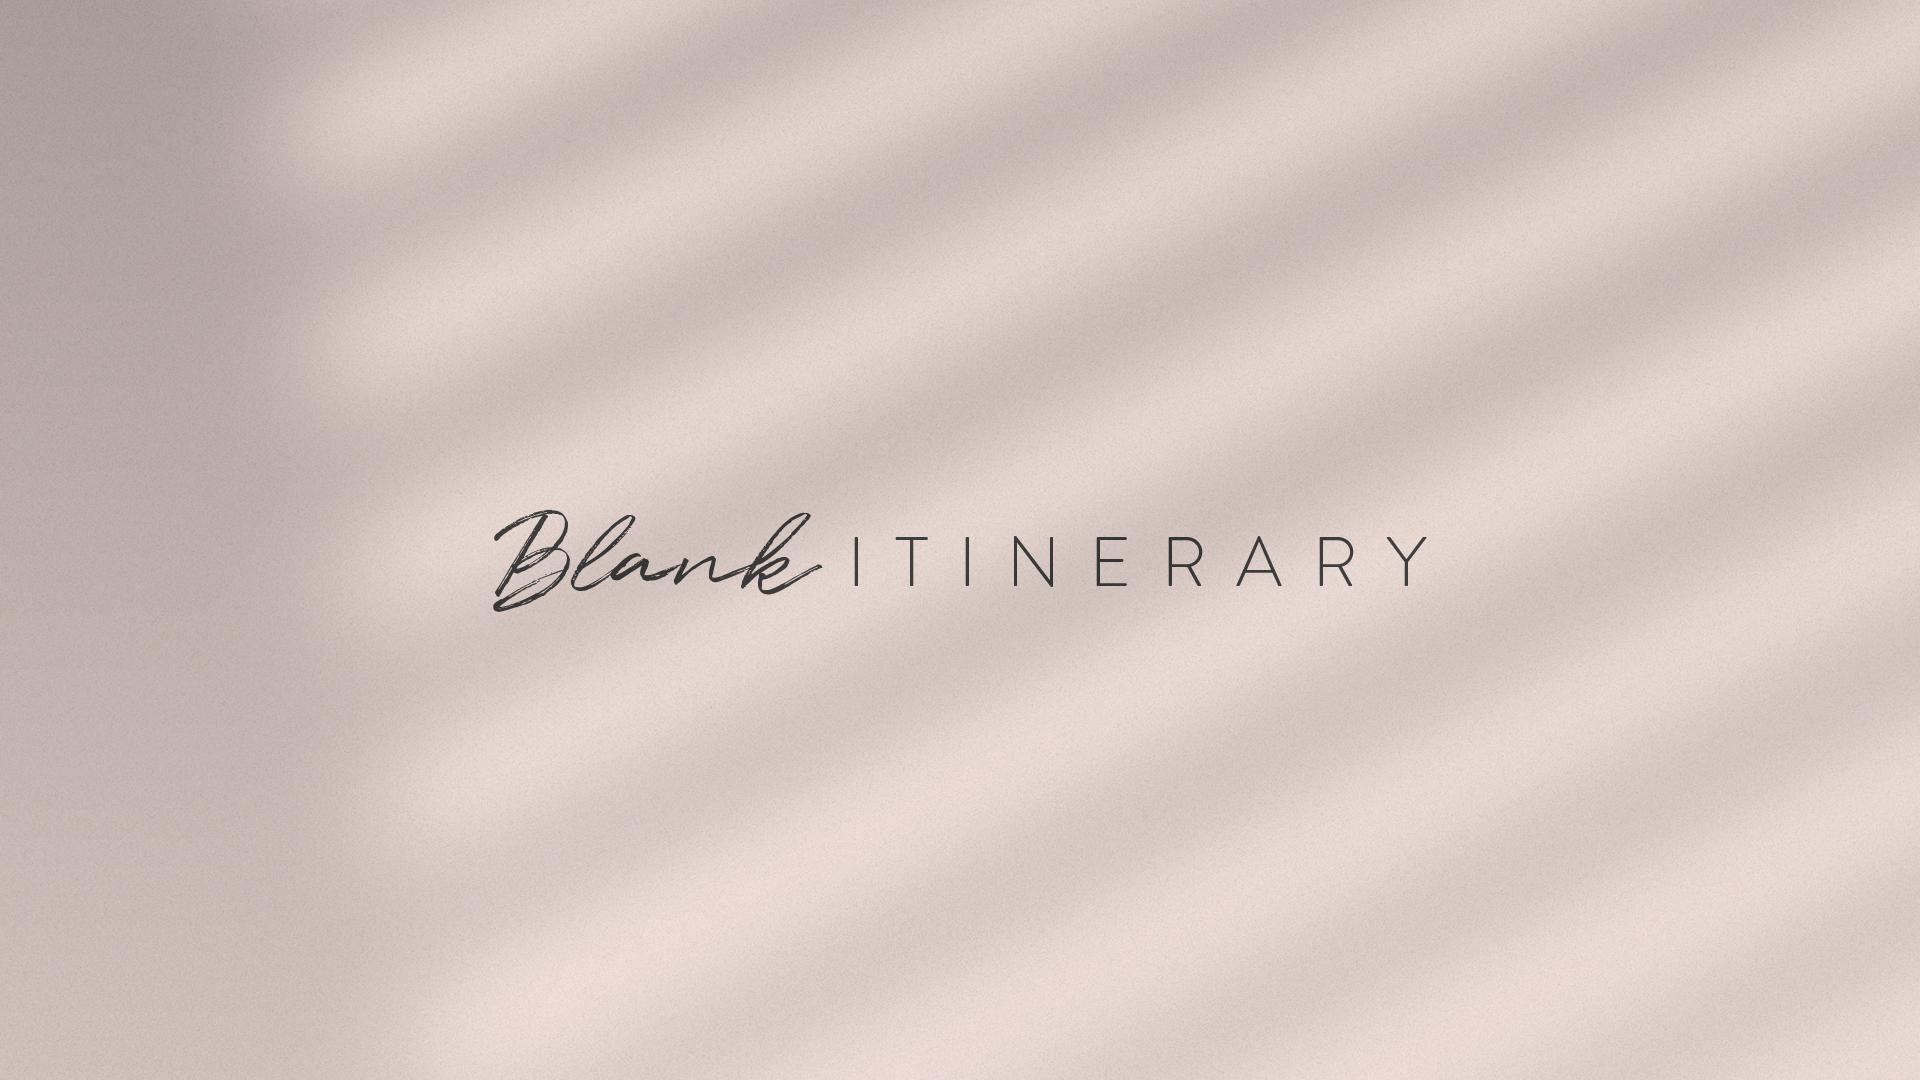 logo-gray-blank-itinerary-yoenpaperland